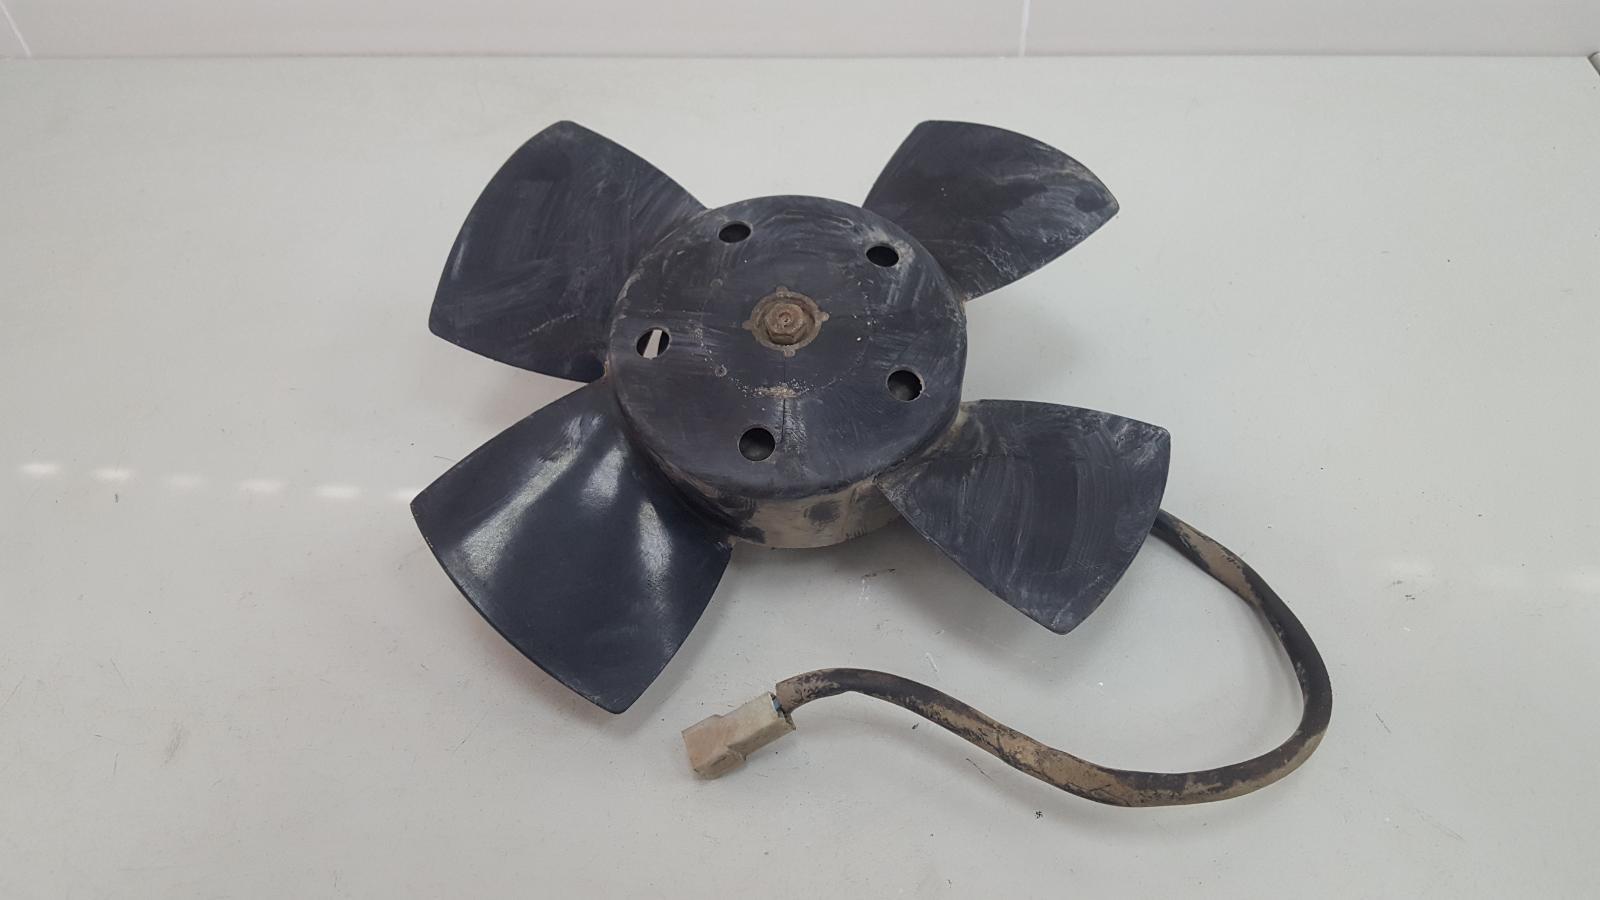 Вентилятор охлаждения радиатора Ваз Лада Самара 2 21140 2111 1.5Л 8КЛ 2006